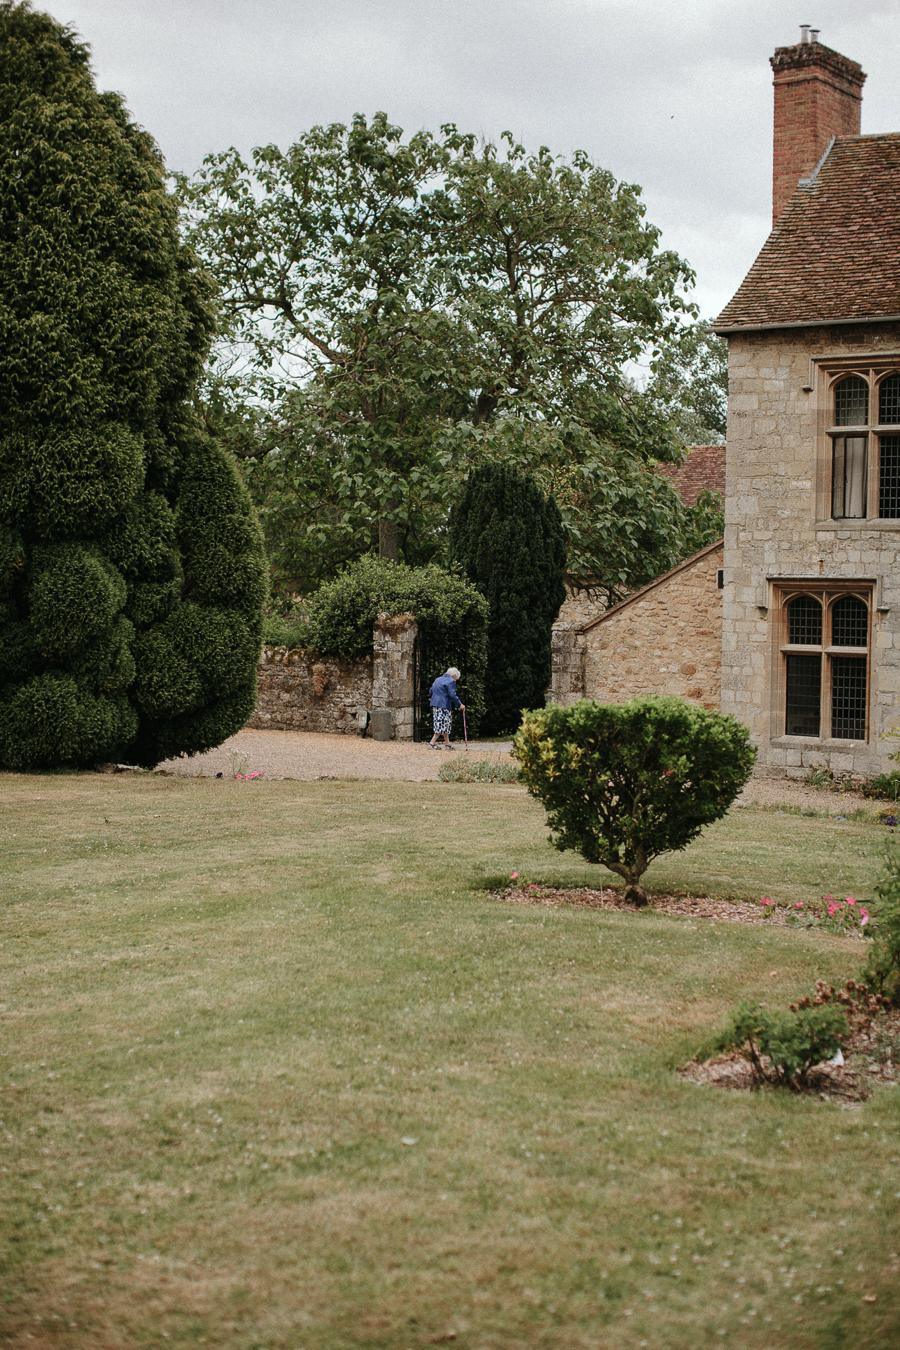 Notley-abbey-buckinghamshire-england-wedding-abi-q-photography--164.jpg